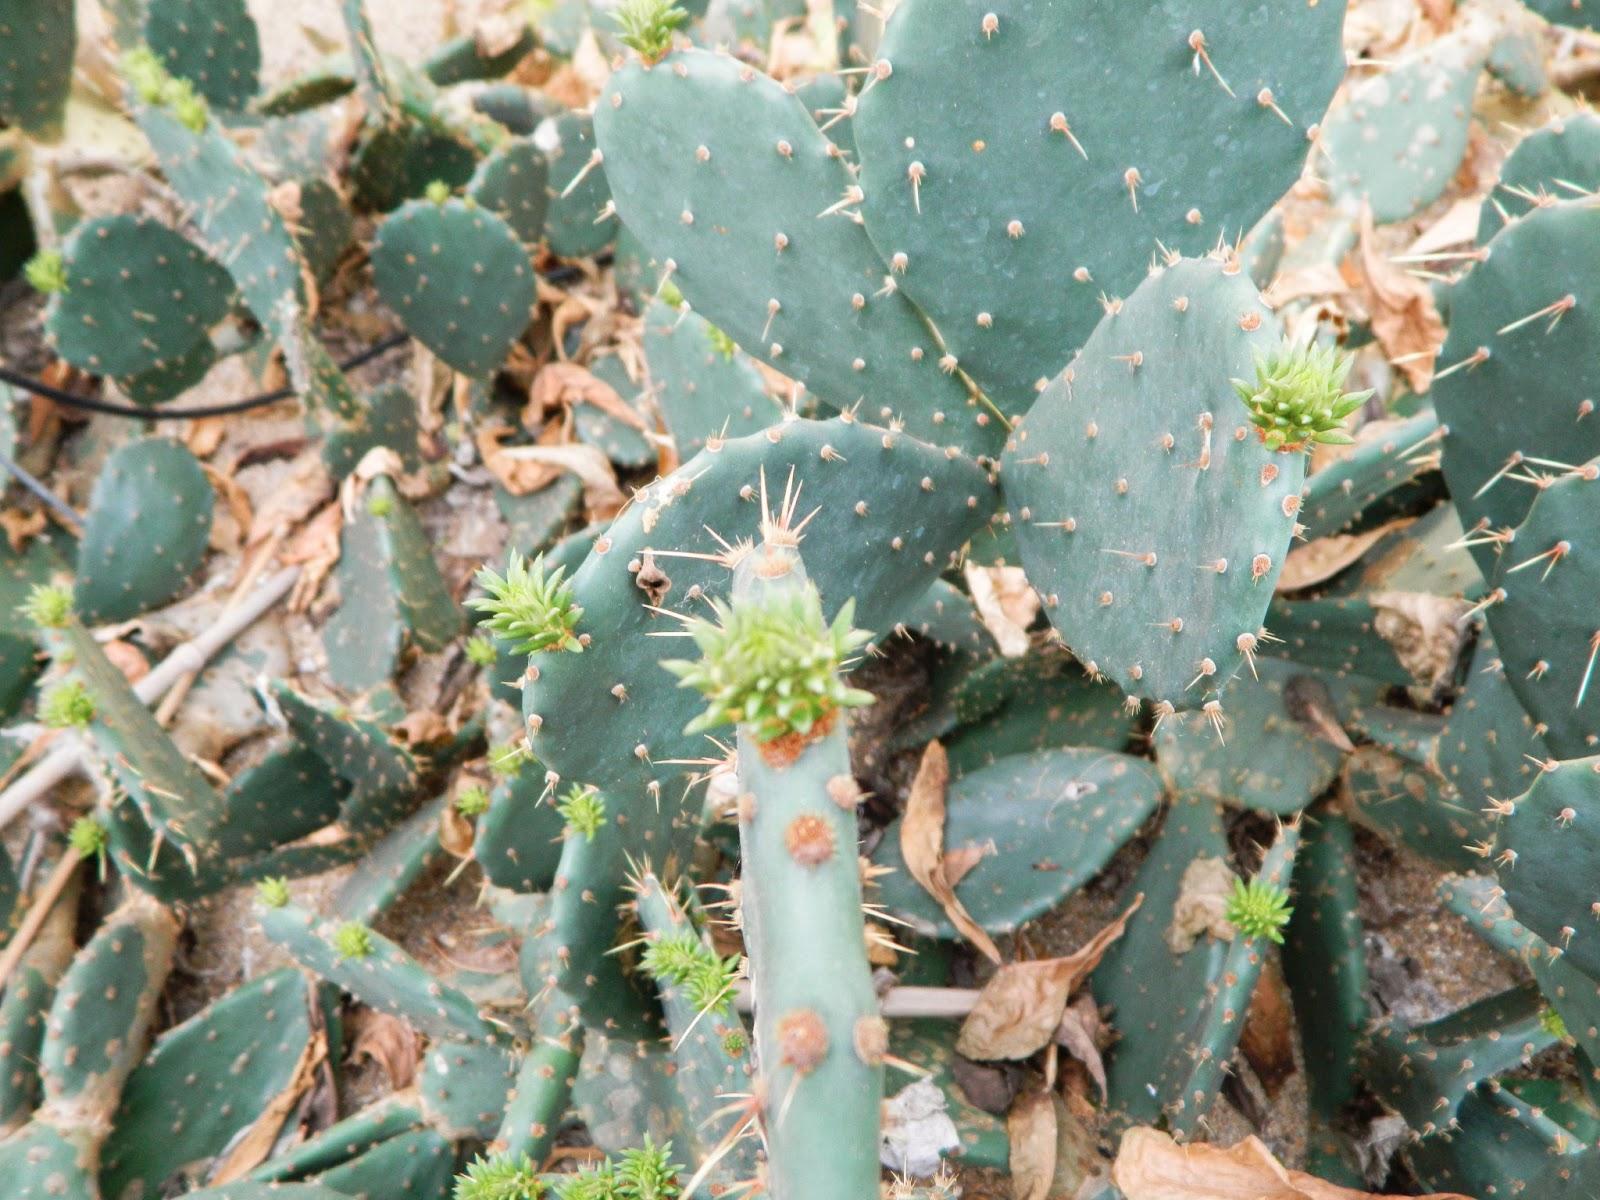 cactus budding